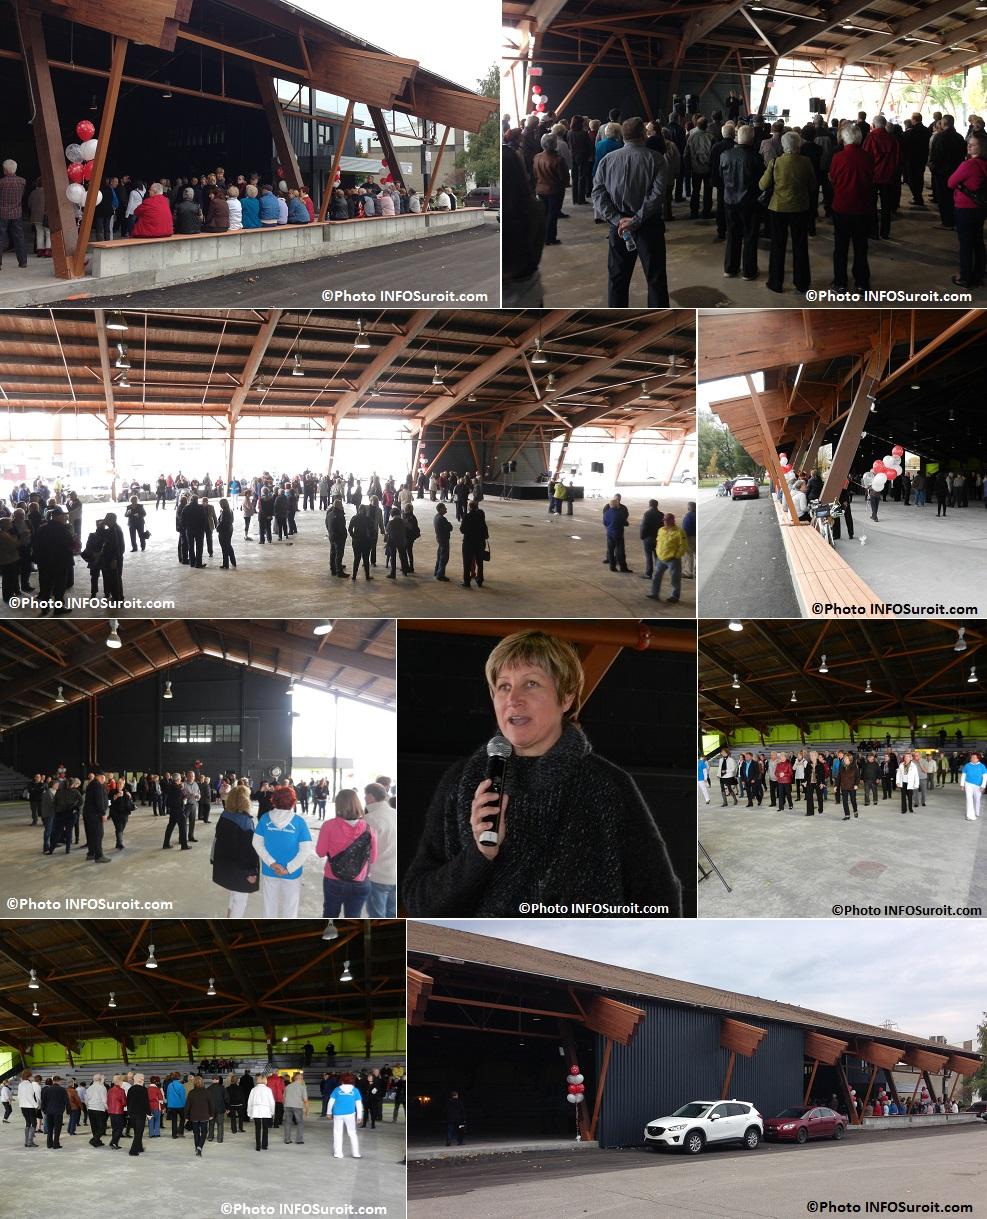 Agora-citoyenne-de-Chateauguay-Inauguration-Montage-Photos-INFOSuroit_com